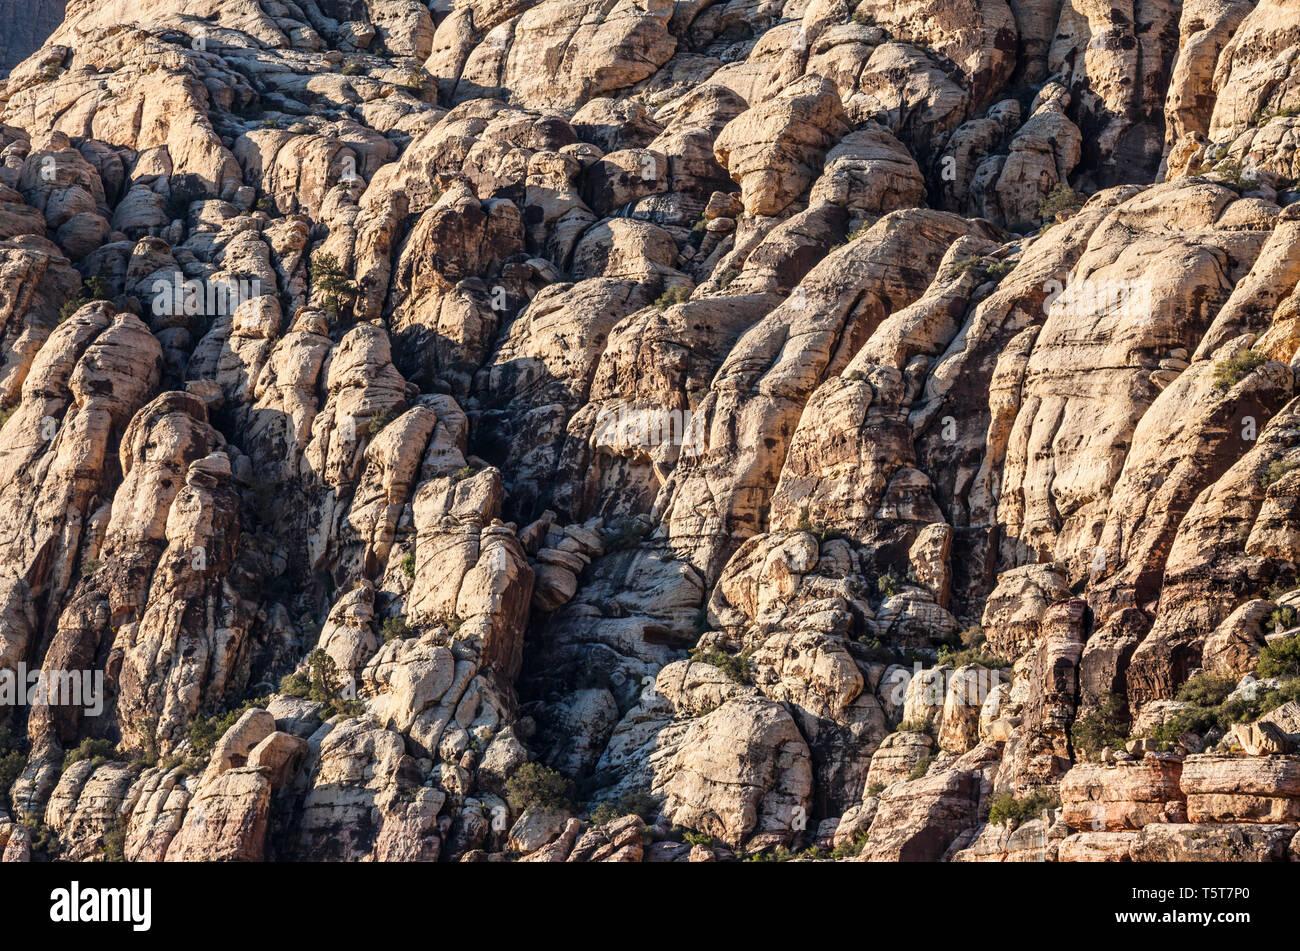 Les falaises de grès, Red Rock Canyon National Conservation Area, Nevada, USA Photo Stock